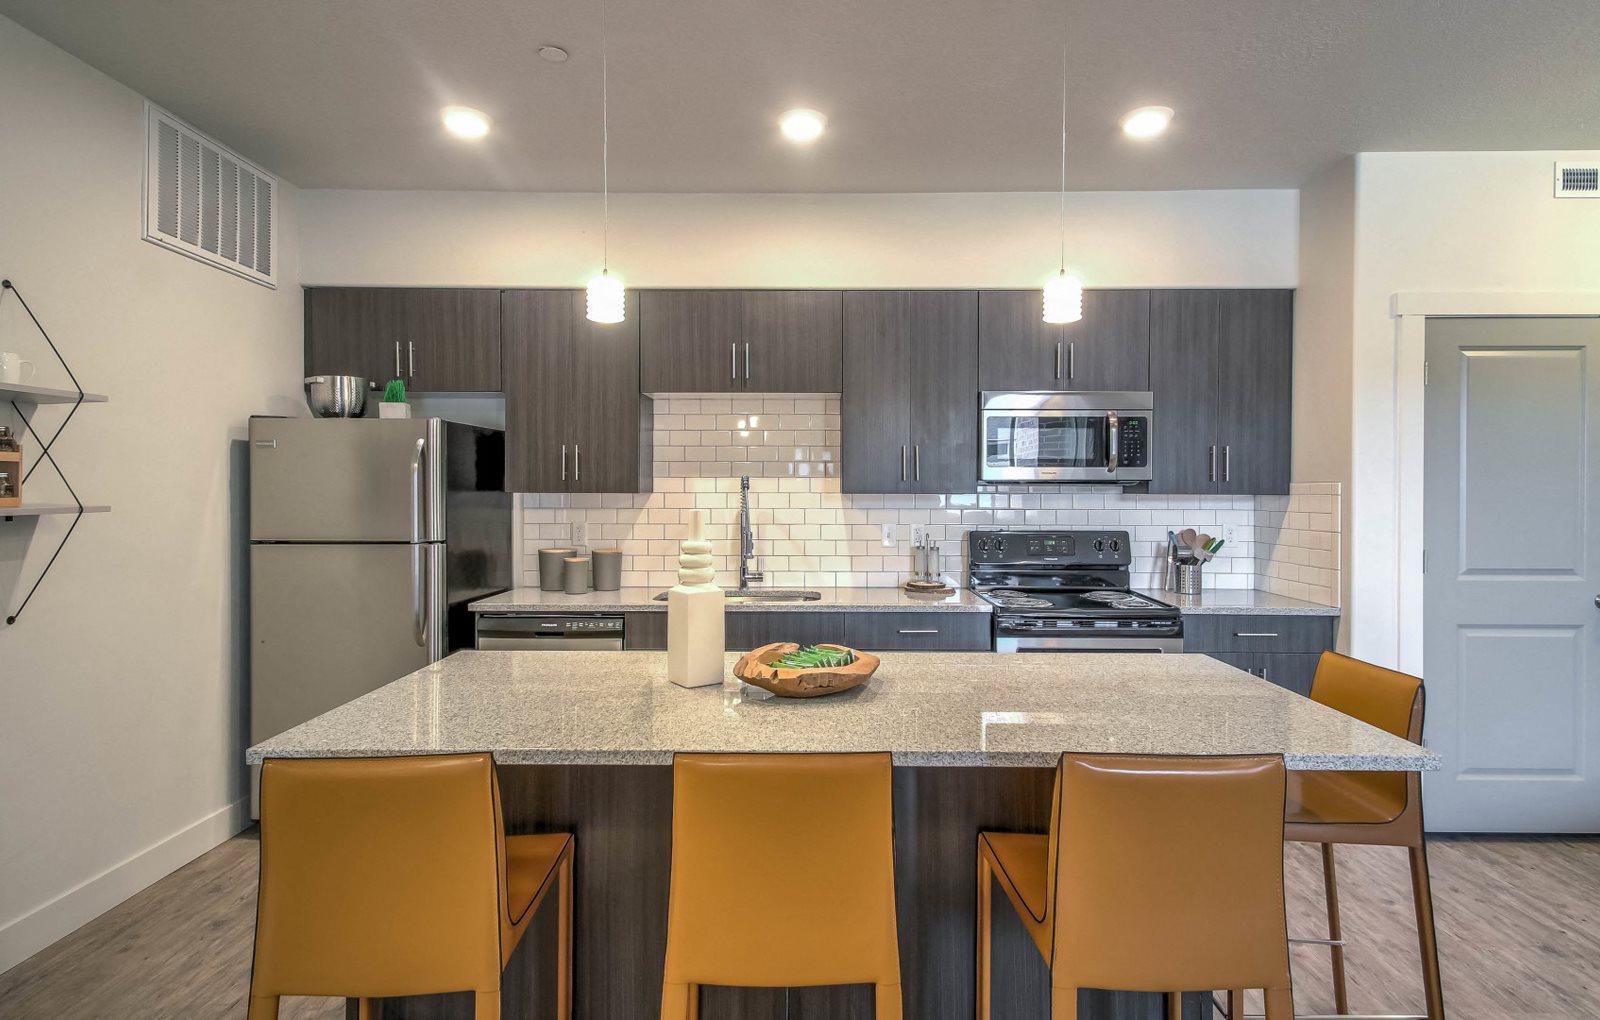 furnished model living room and kitchen